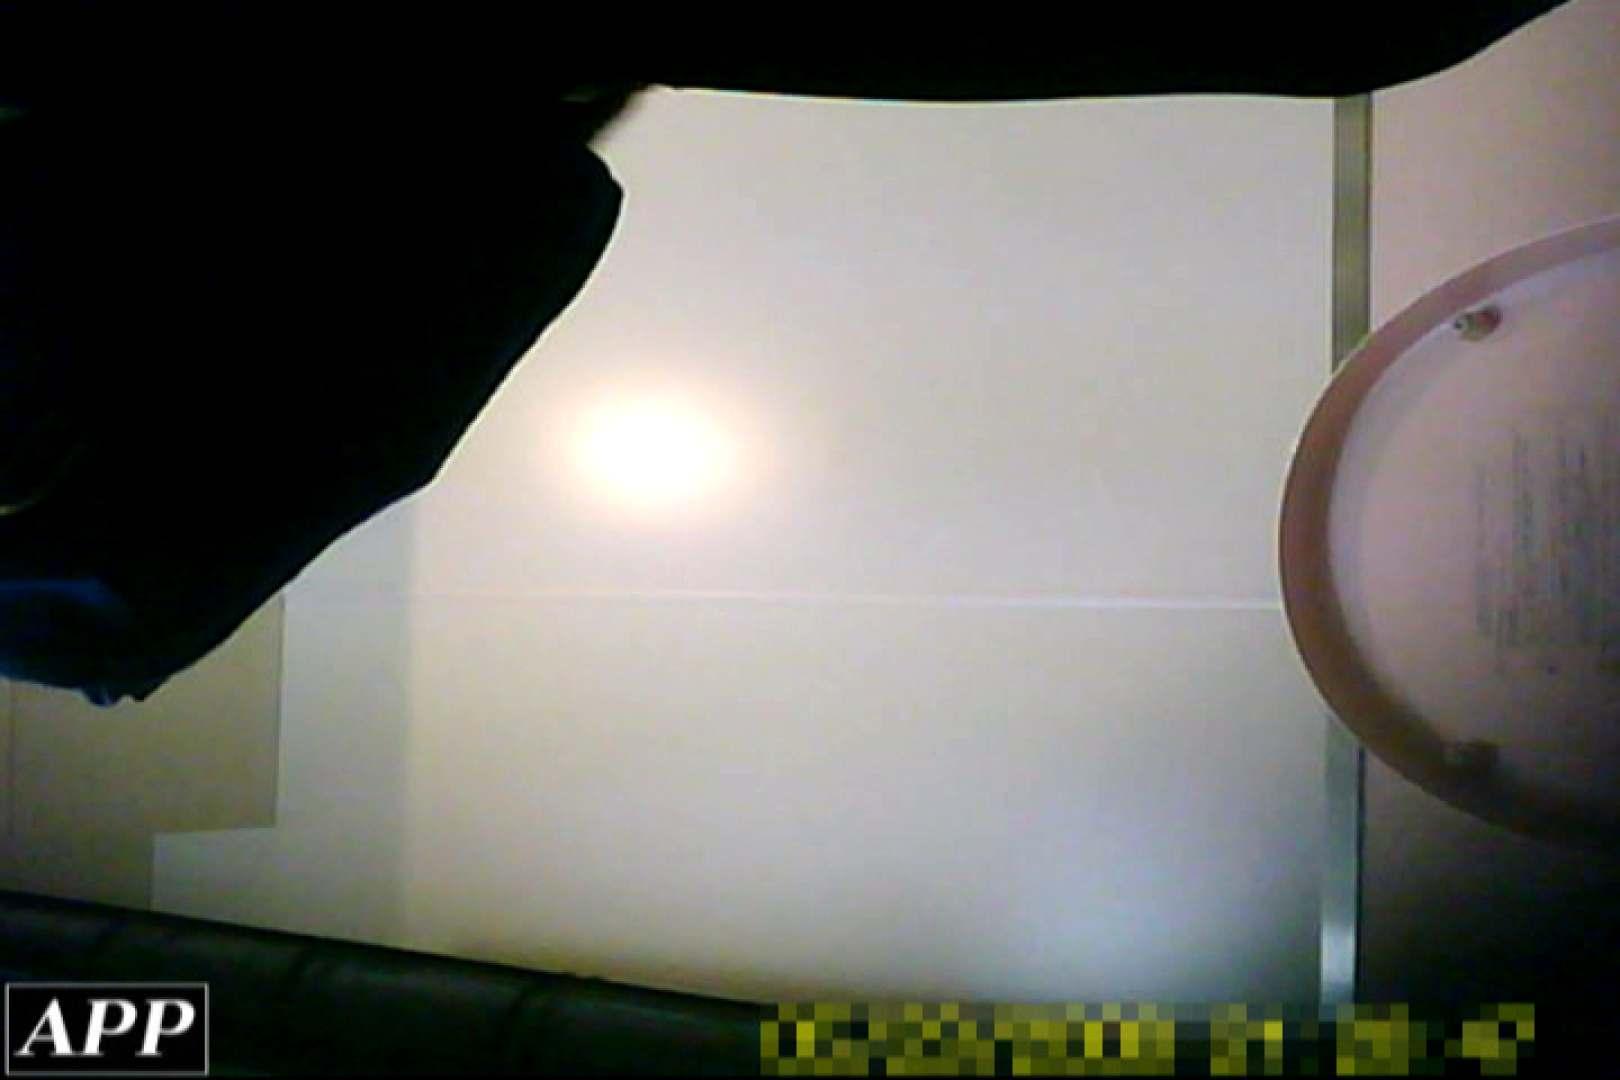 3視点洗面所 vol.33 盗撮で悶絶 セックス無修正動画無料 68画像 4